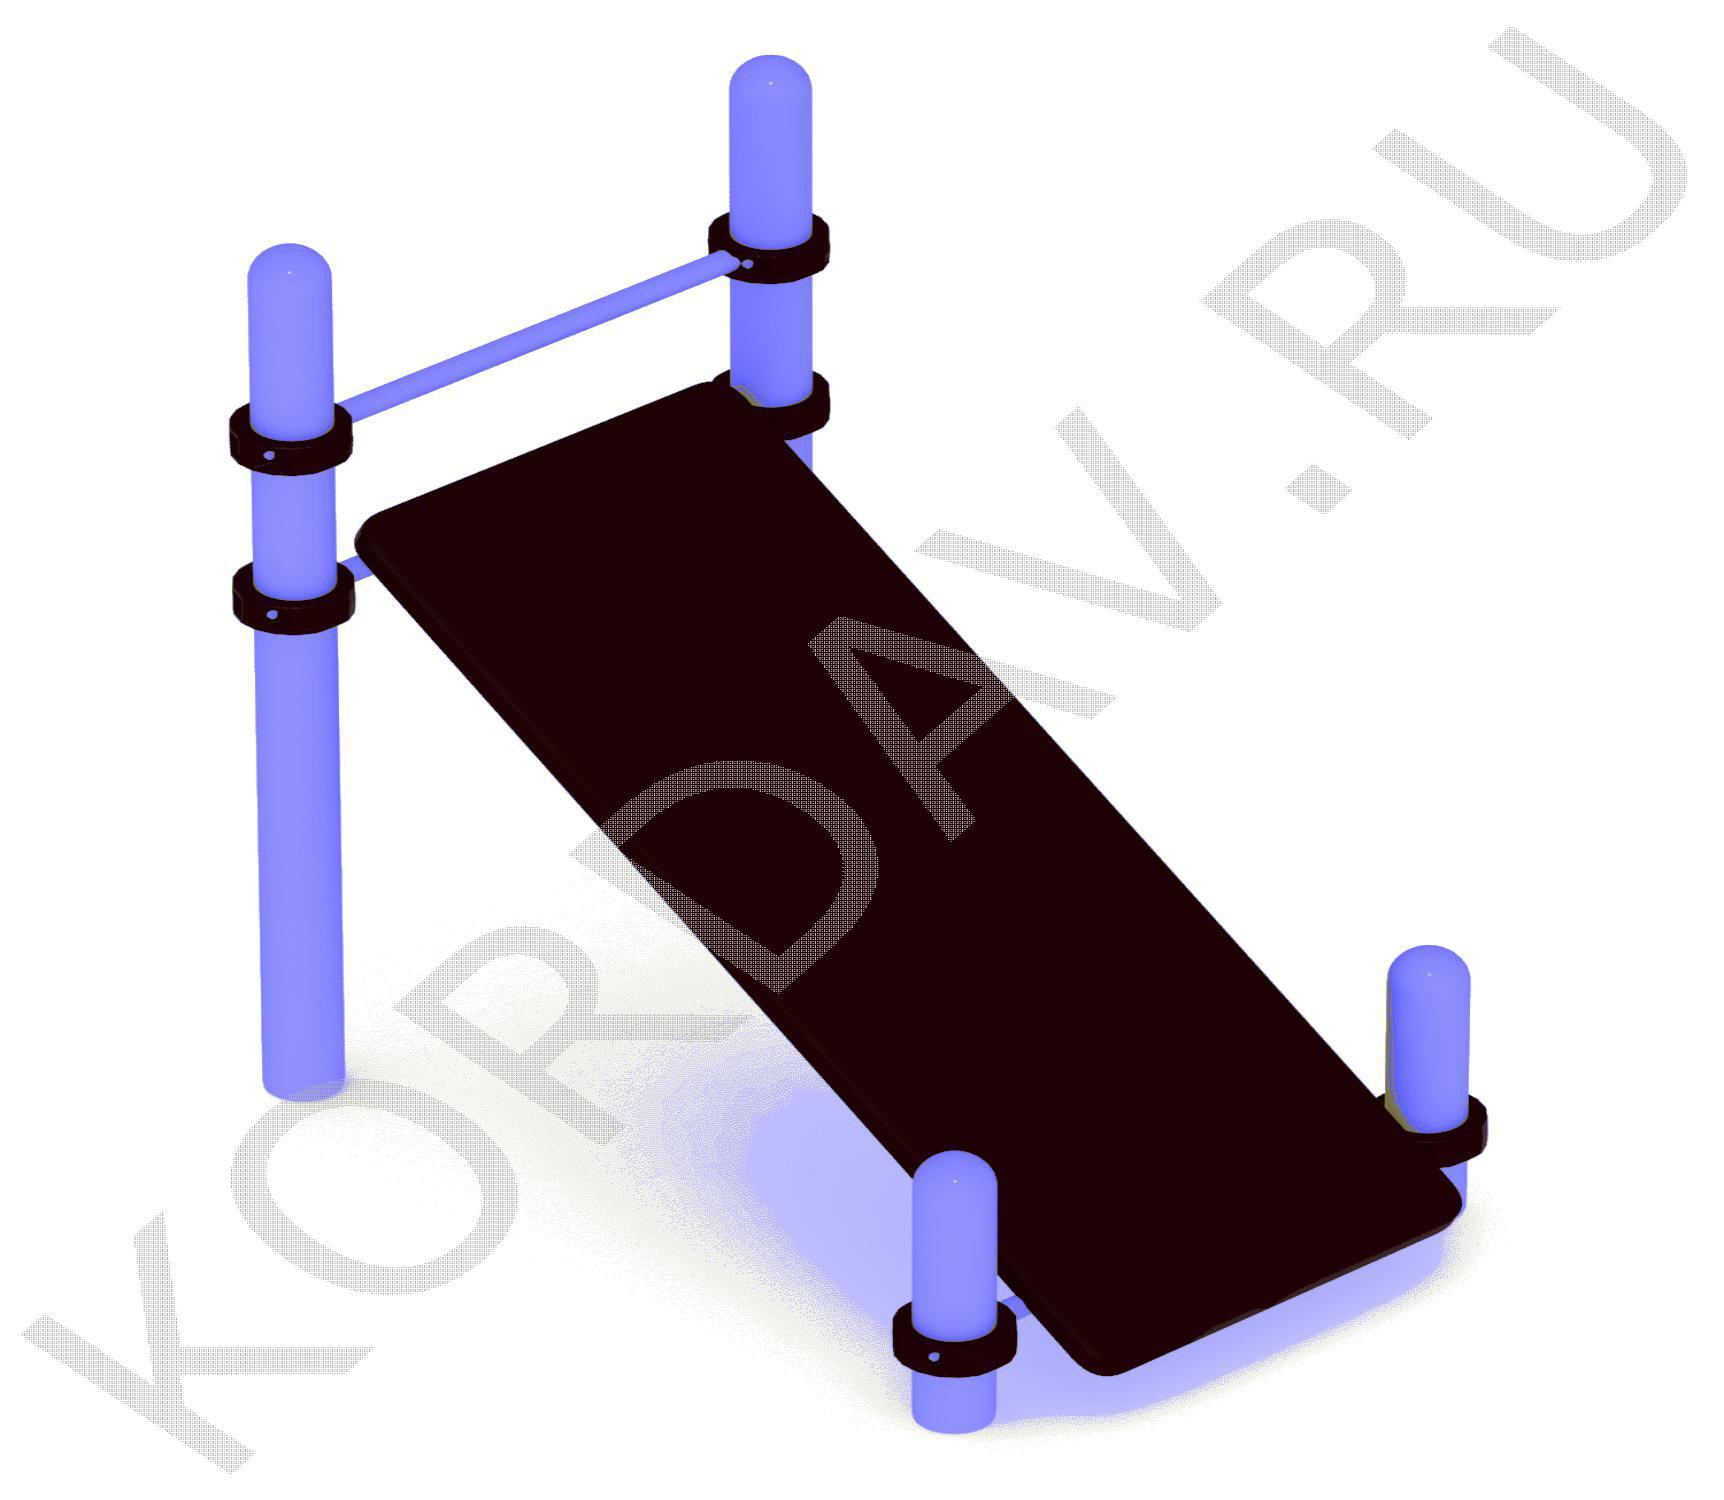 Воркаут Для спины (108 труба) СТ 1.261